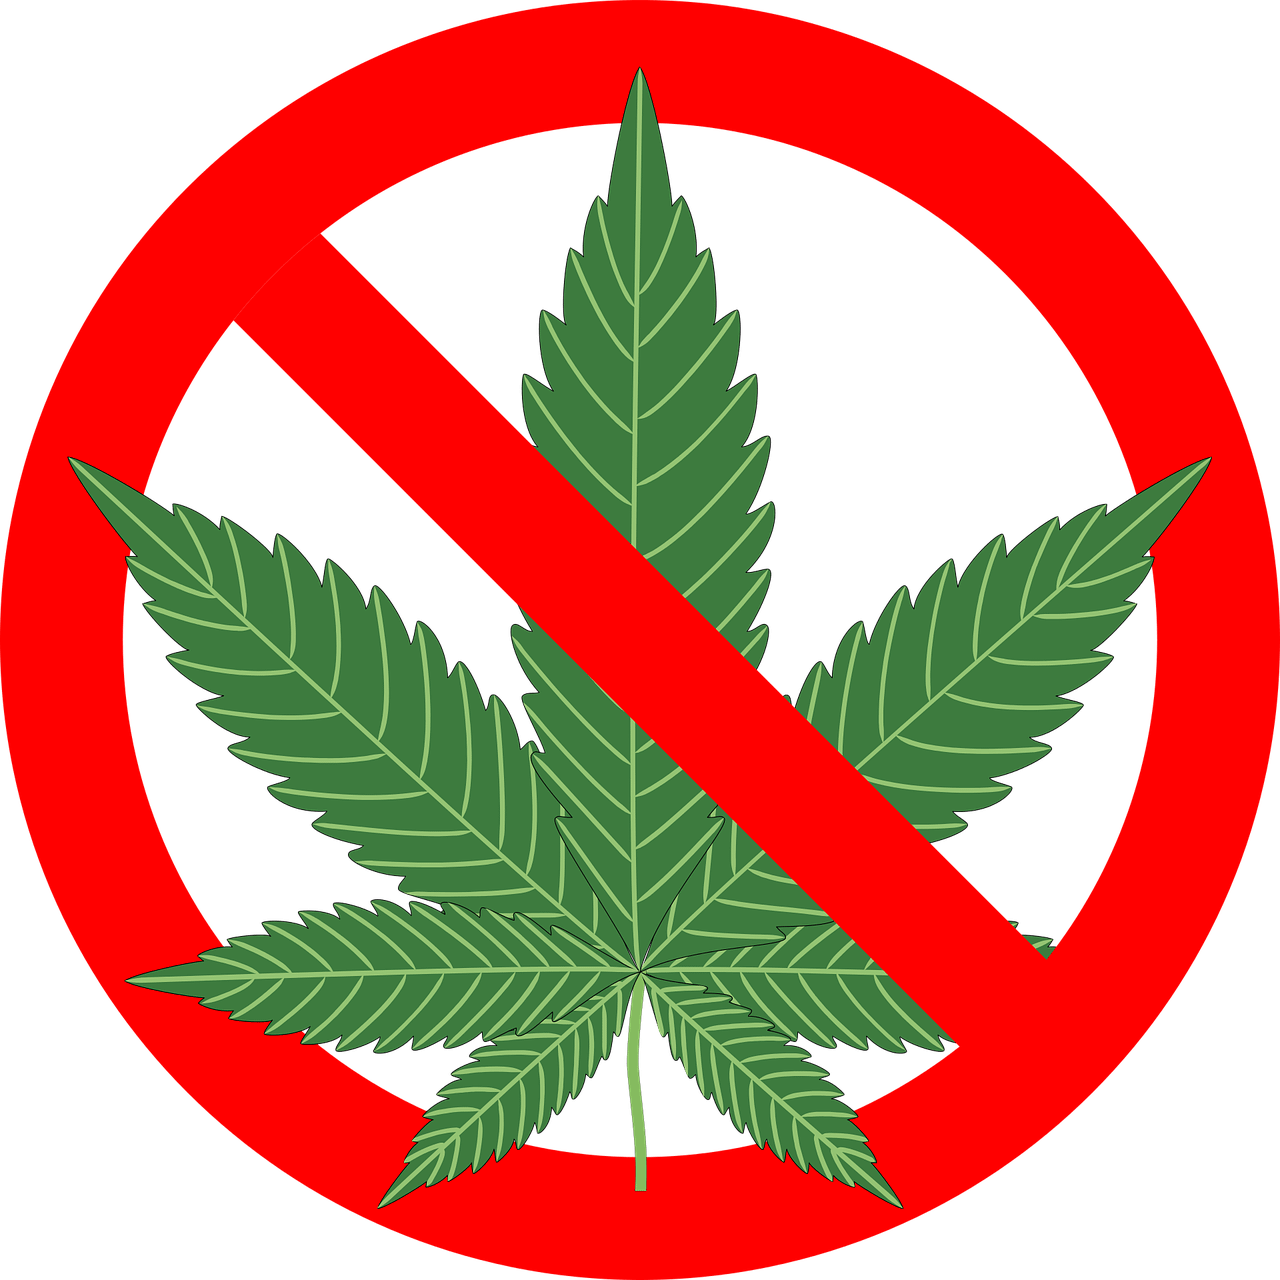 """no pot"" street sign"